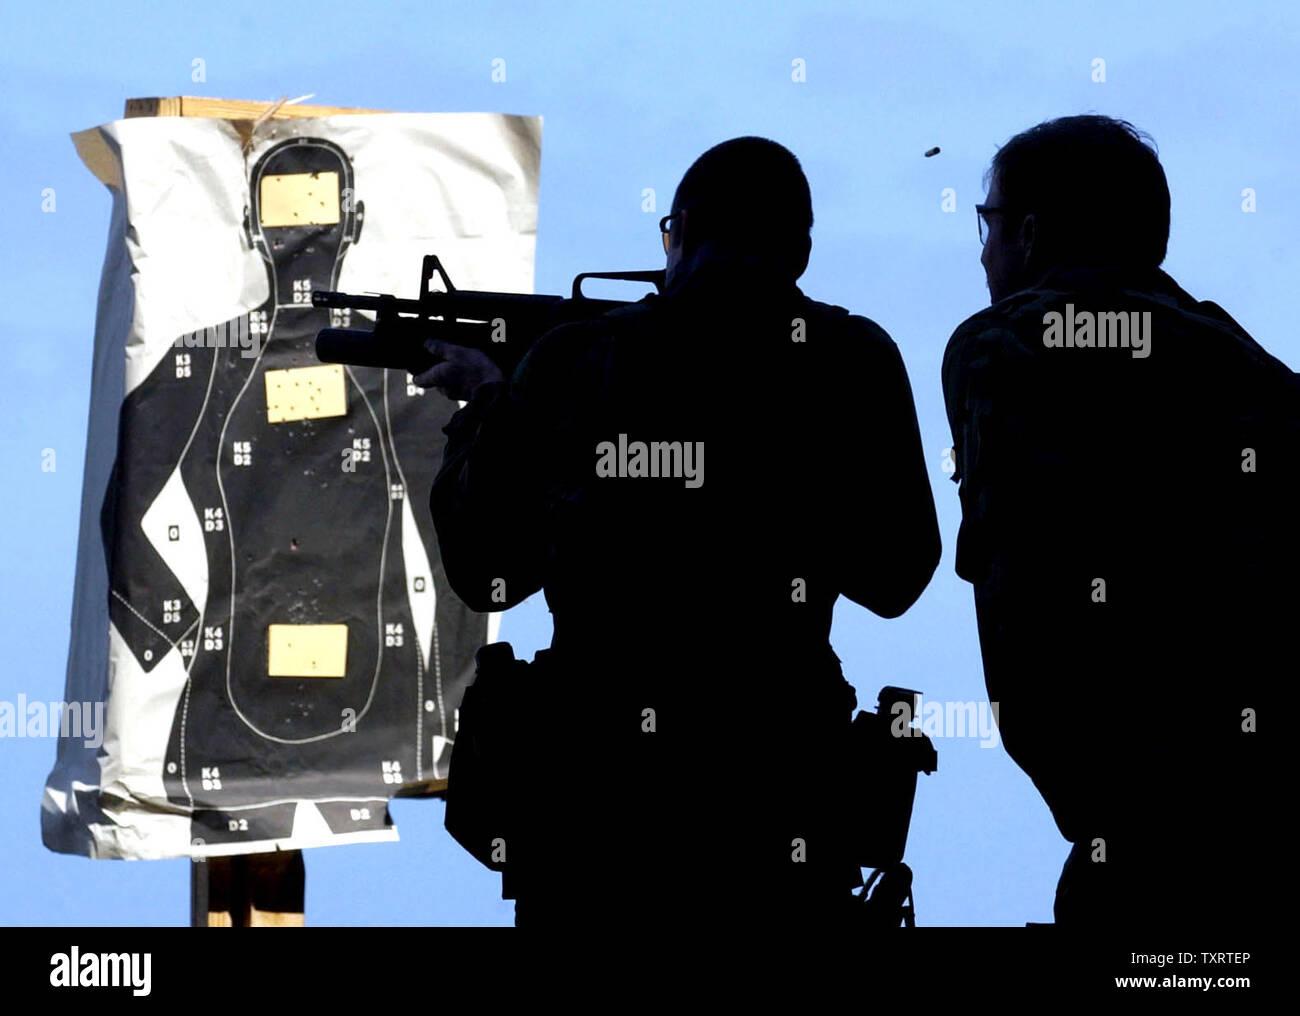 Seal Team Stock Photos & Seal Team Stock Images - Alamy